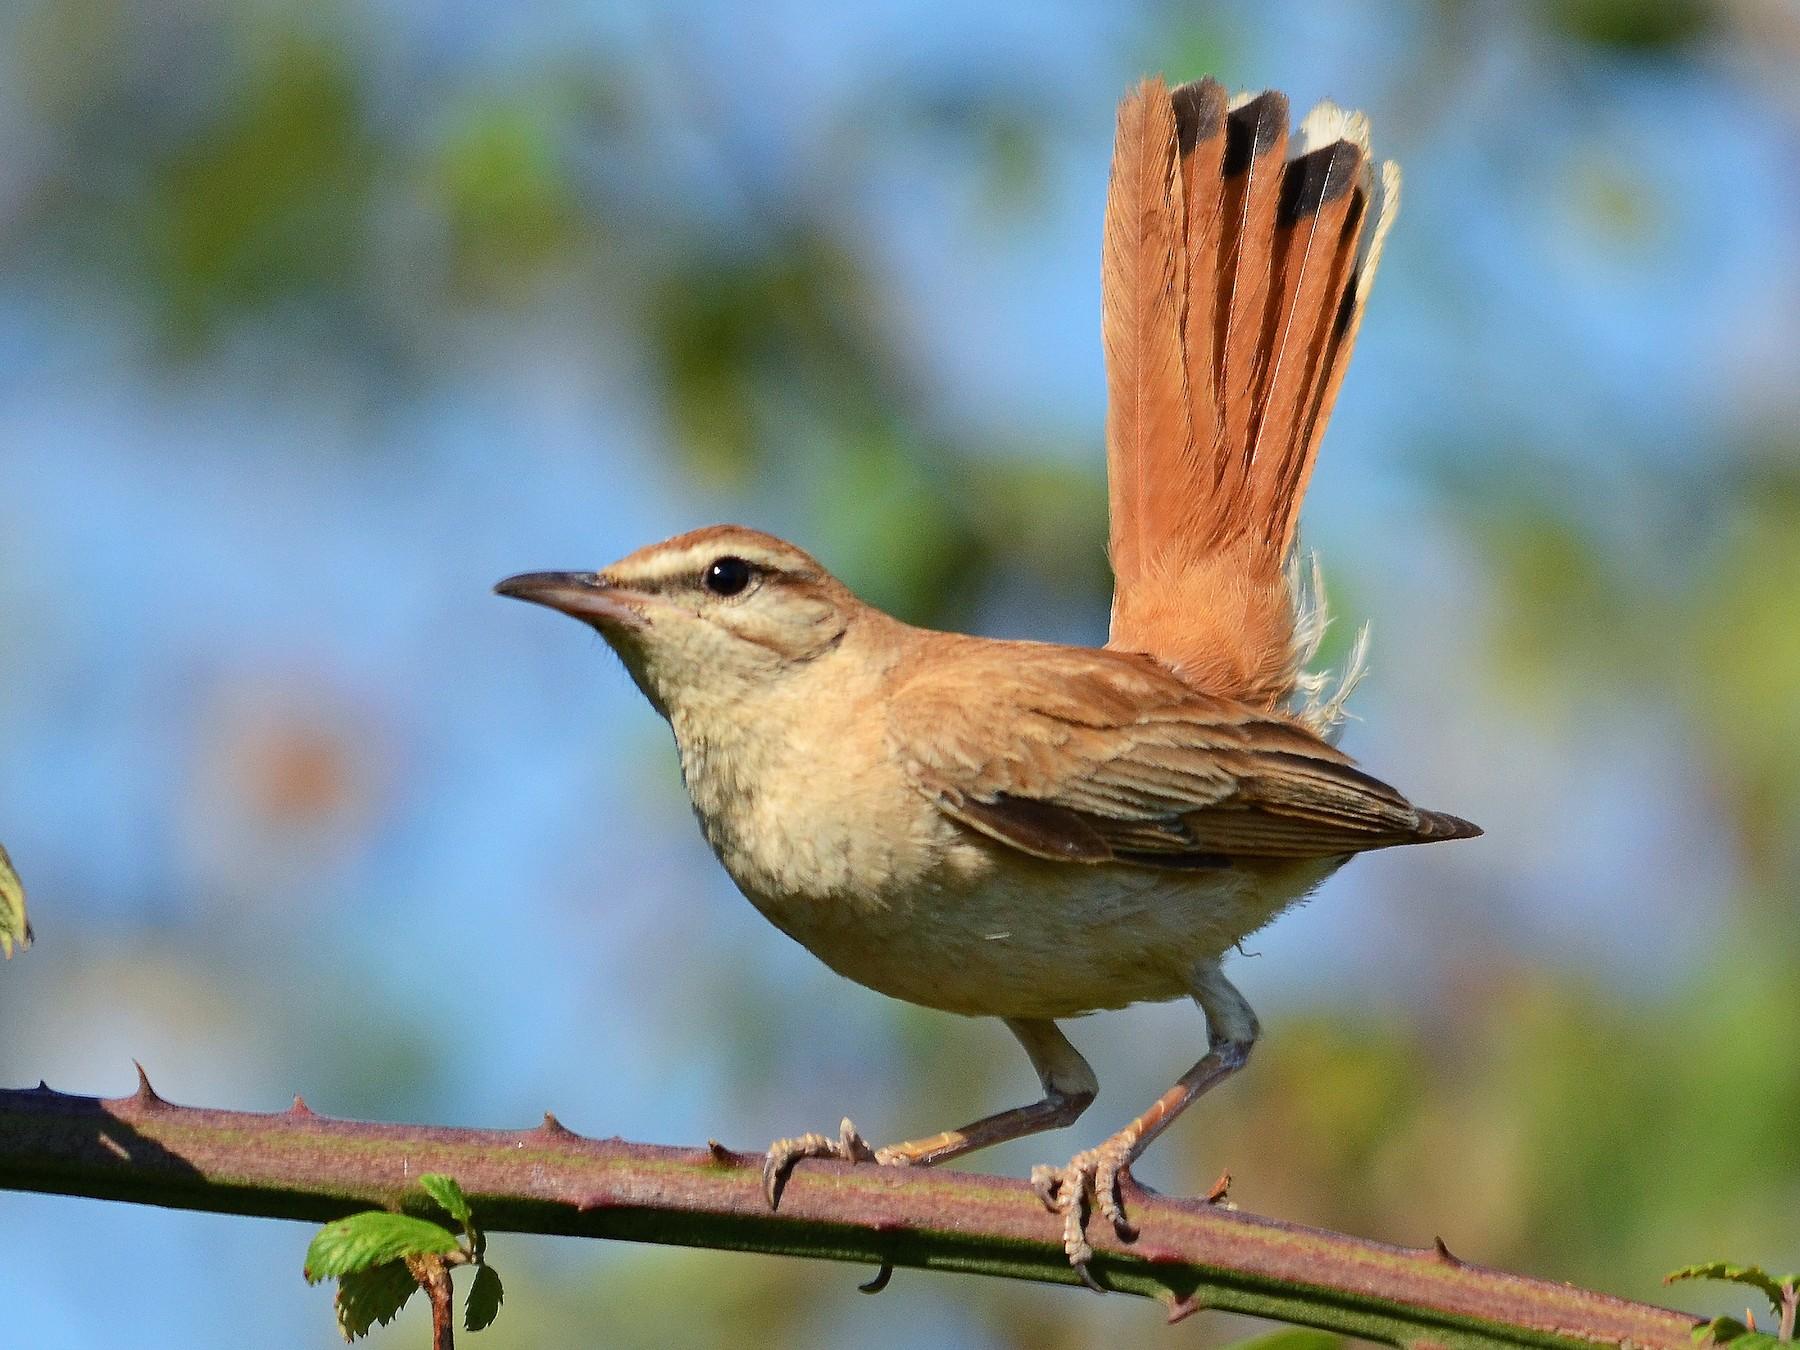 Rufous-tailed Scrub-Robin - José Frade